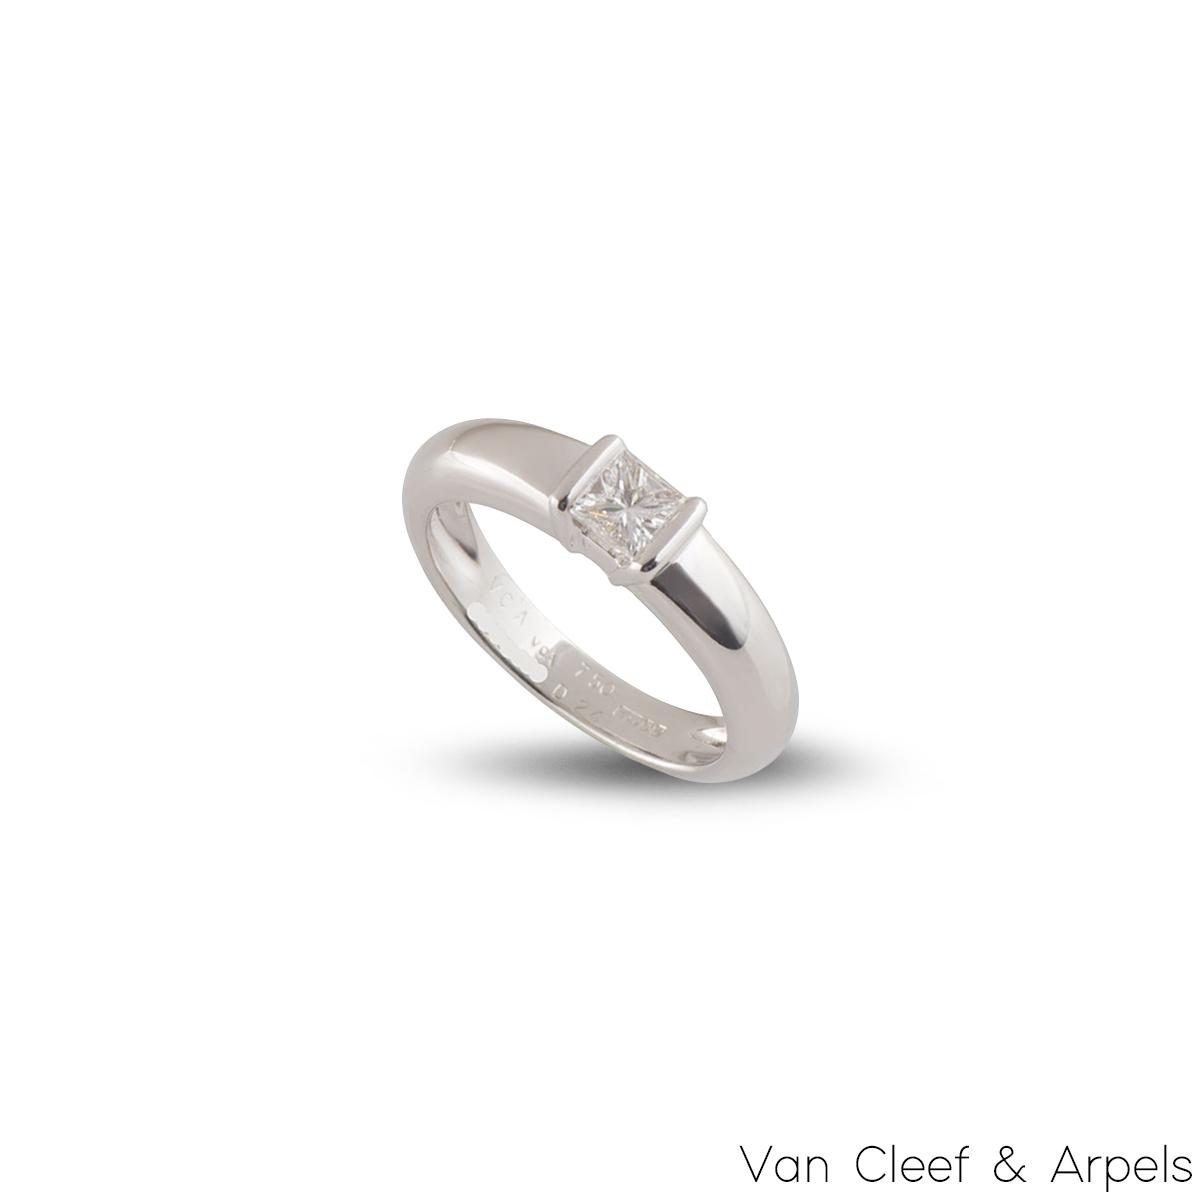 Van Cleef & Arpels White Gold Diamond Ring 0.24ct E/VVS+